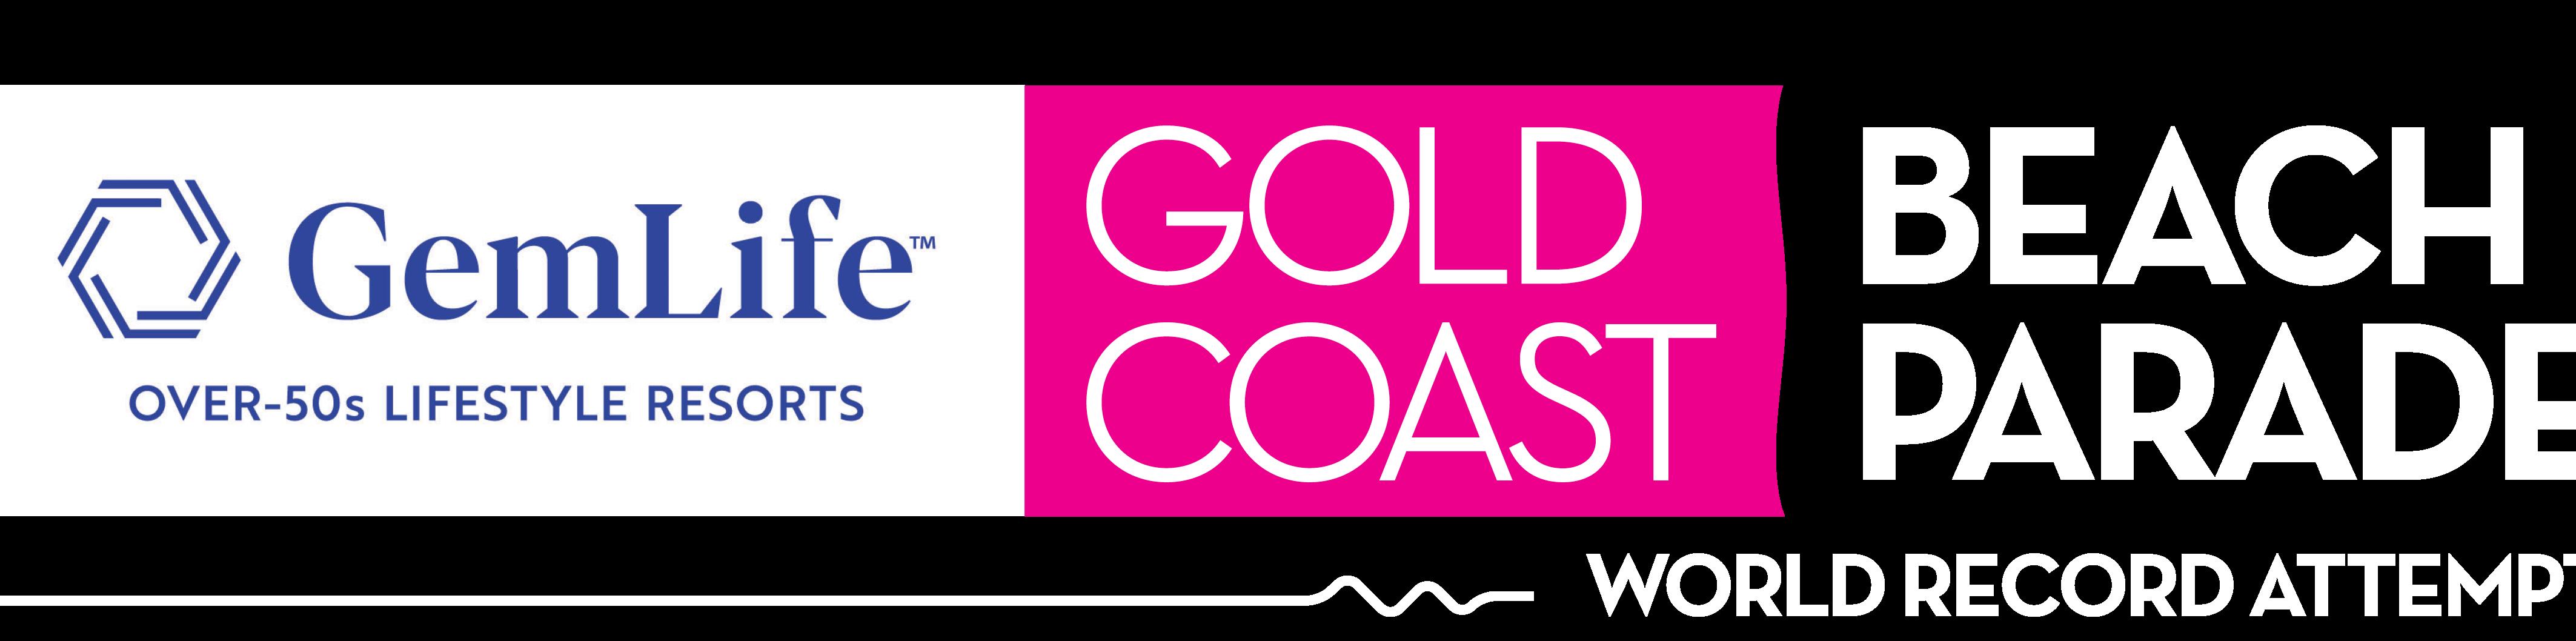 Gold Coast Beach Parade